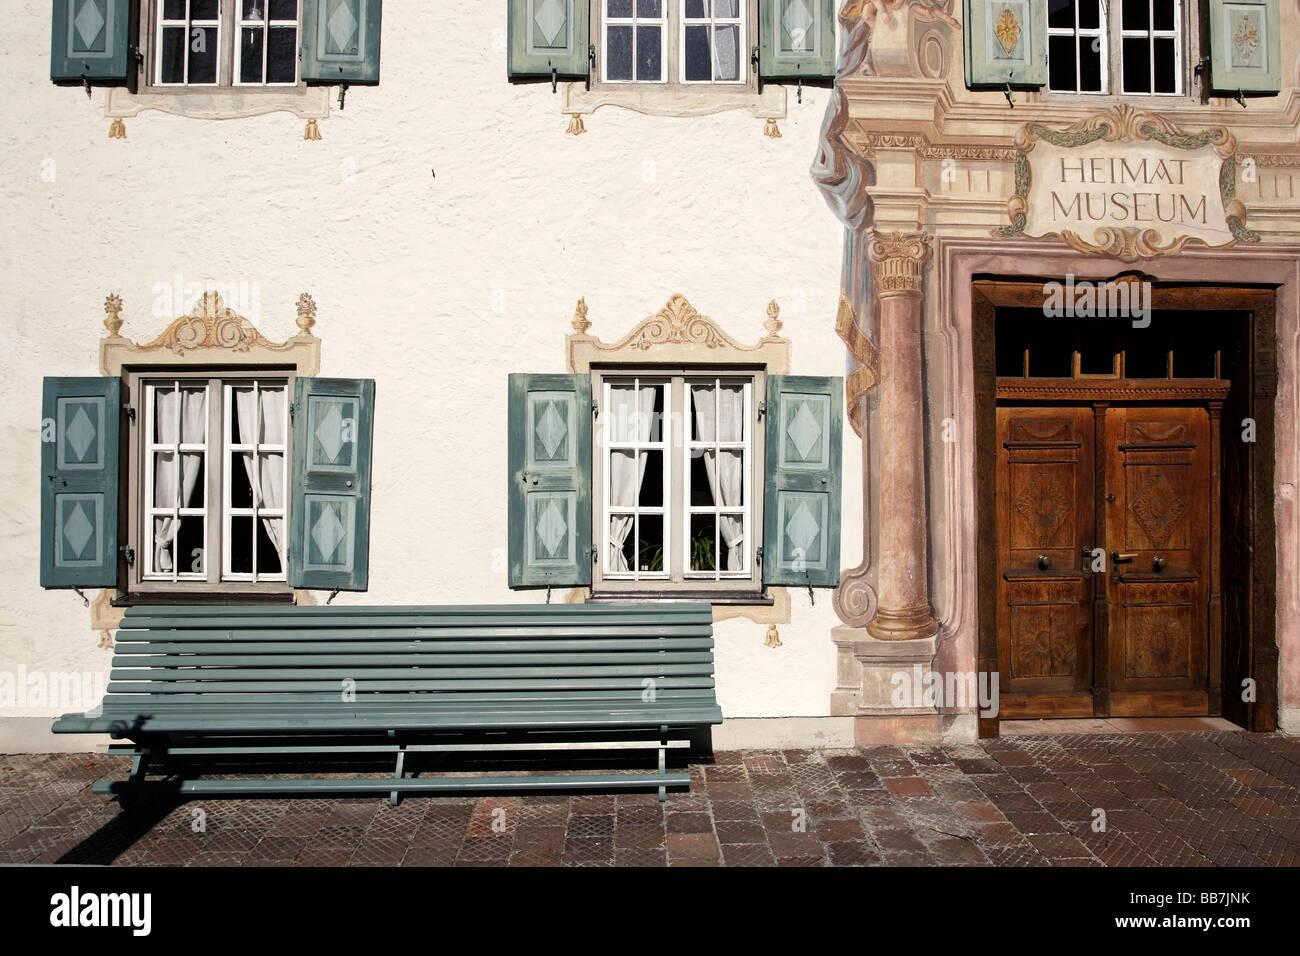 Heimat Museum the Regional Museum of Prien & Heimat Museum the Regional Museum of Prien Stock Photo Royalty Free ...